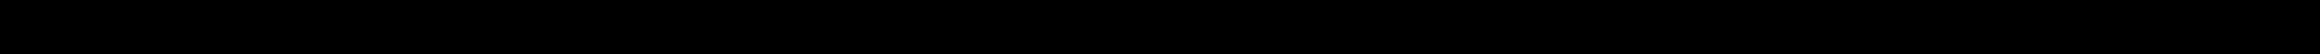 CASCO 1204108, 1204121, 24439410, 302004028, 55556070 Γεννήτρια